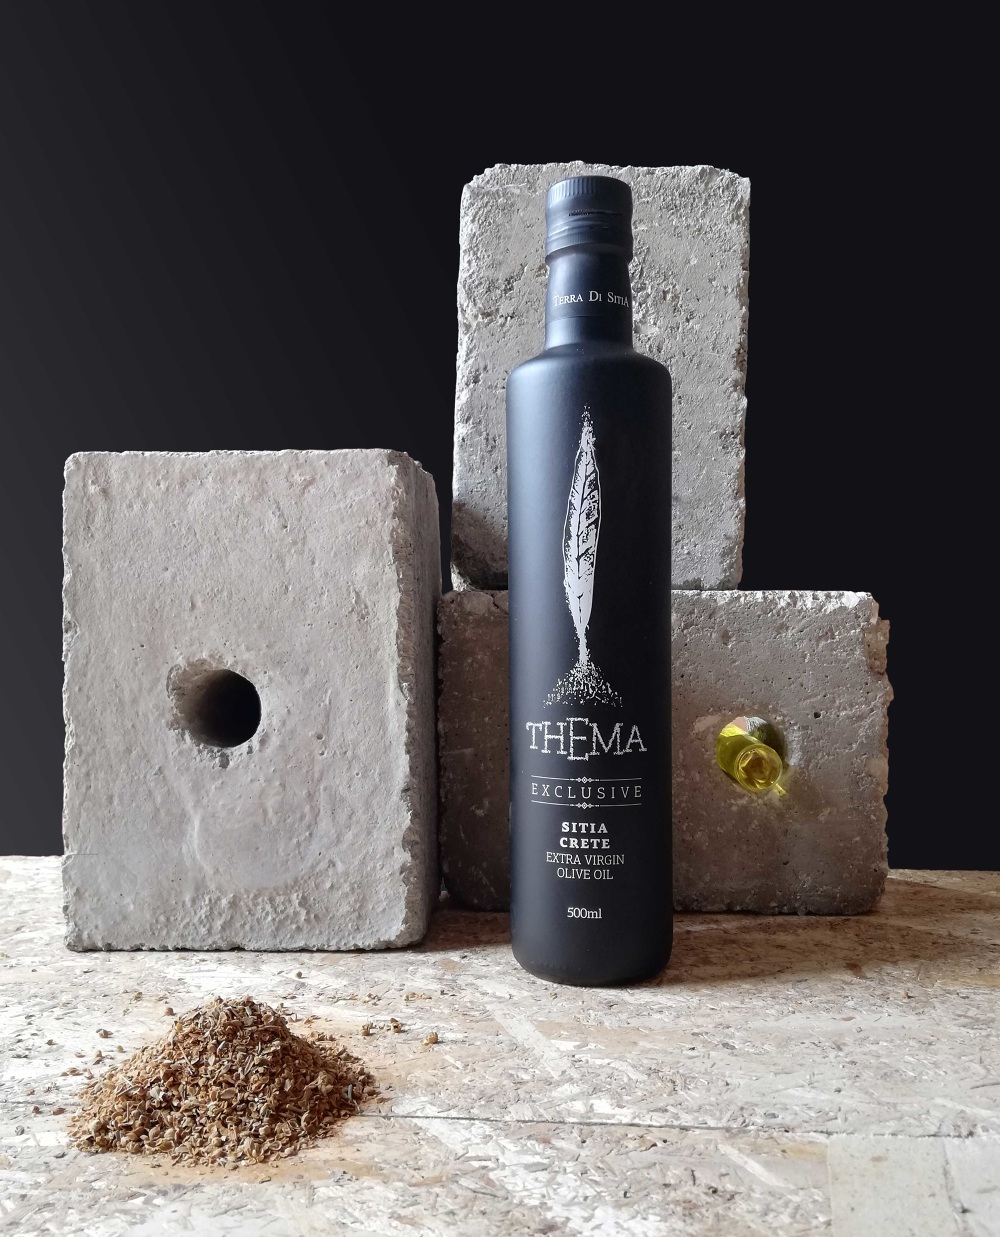 Thema Olive Oil Exclusive